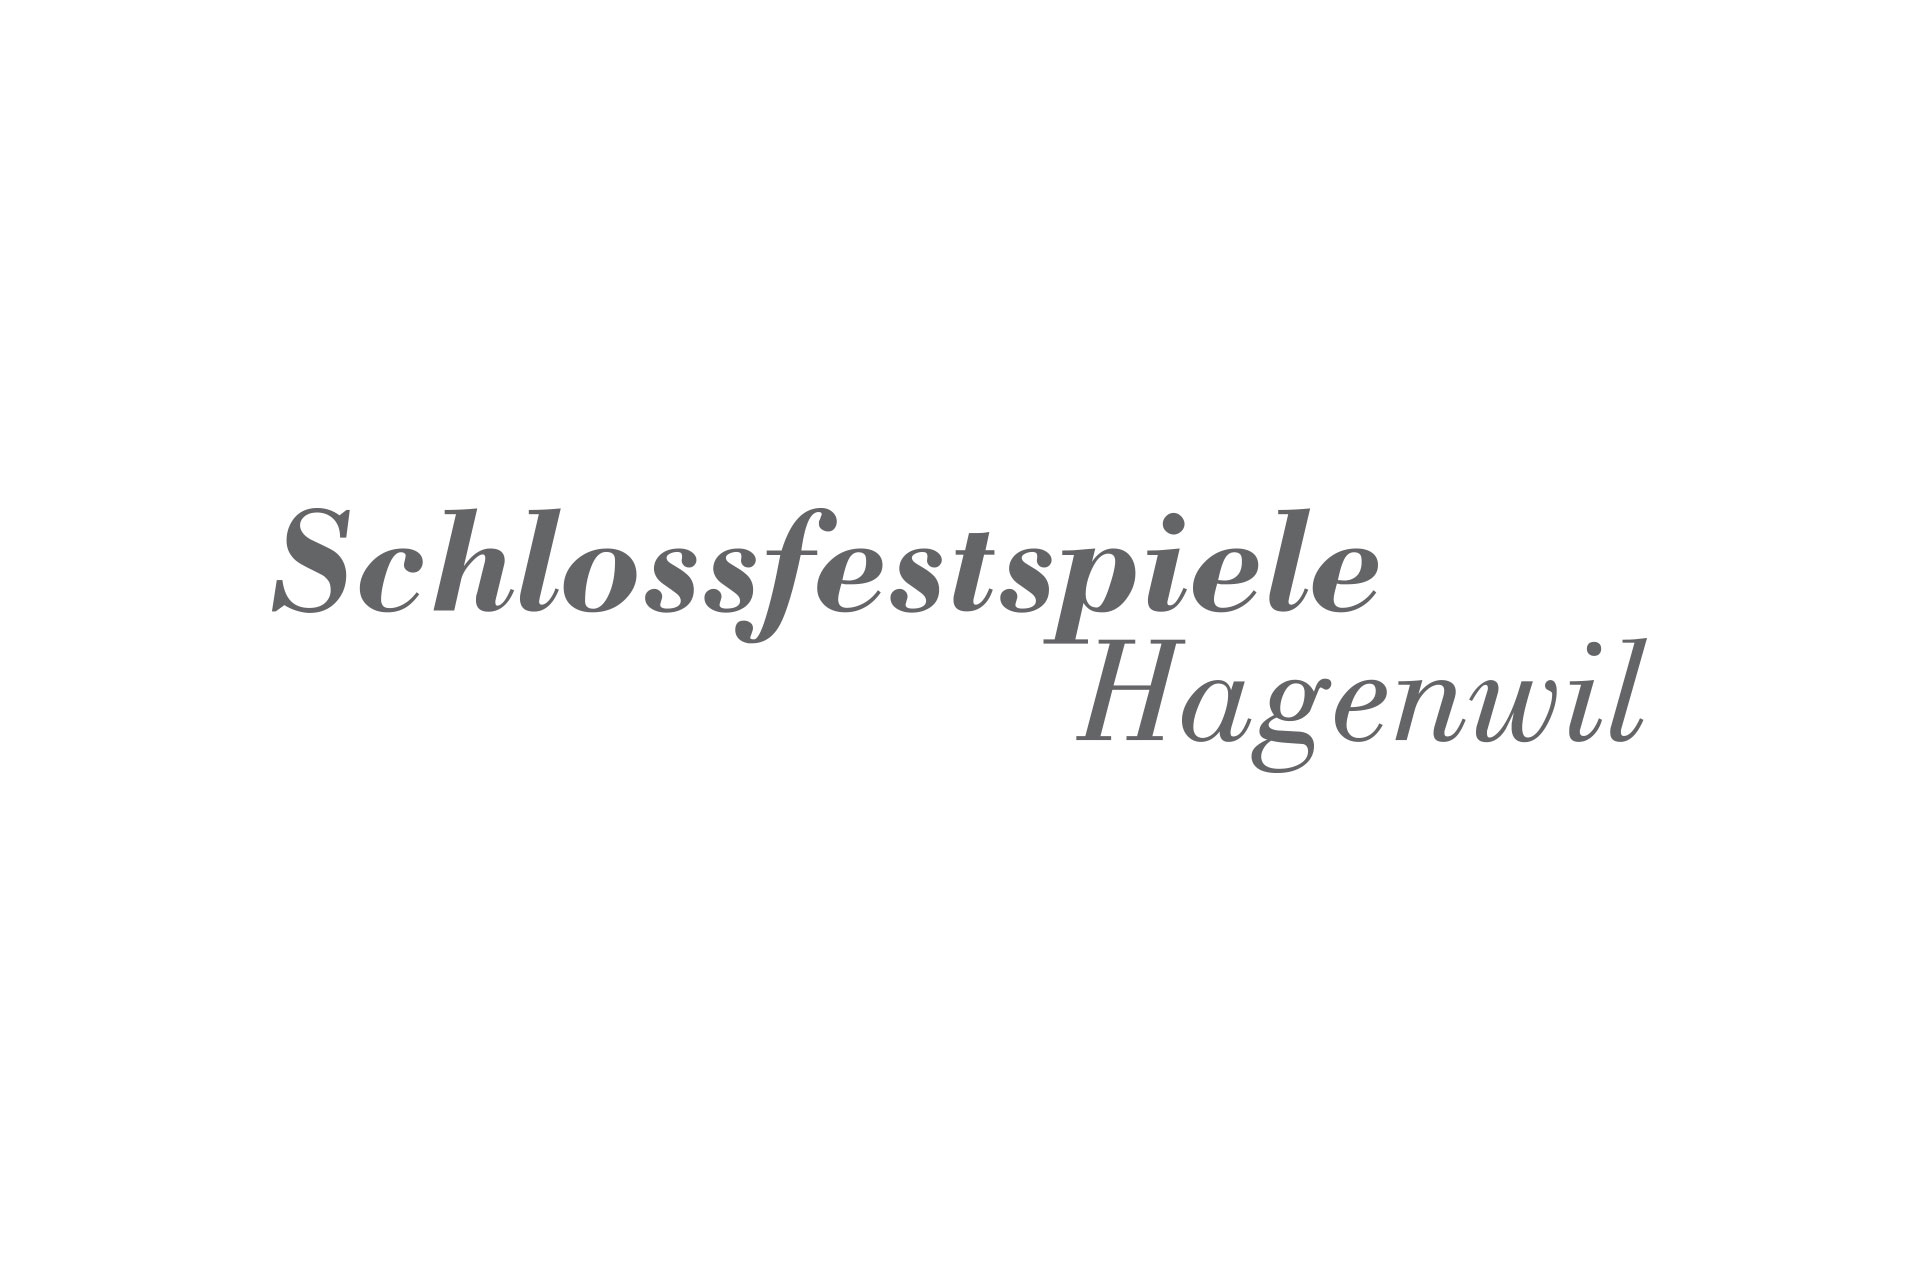 SchlossfestspieleHagenwil_Logo.jpg